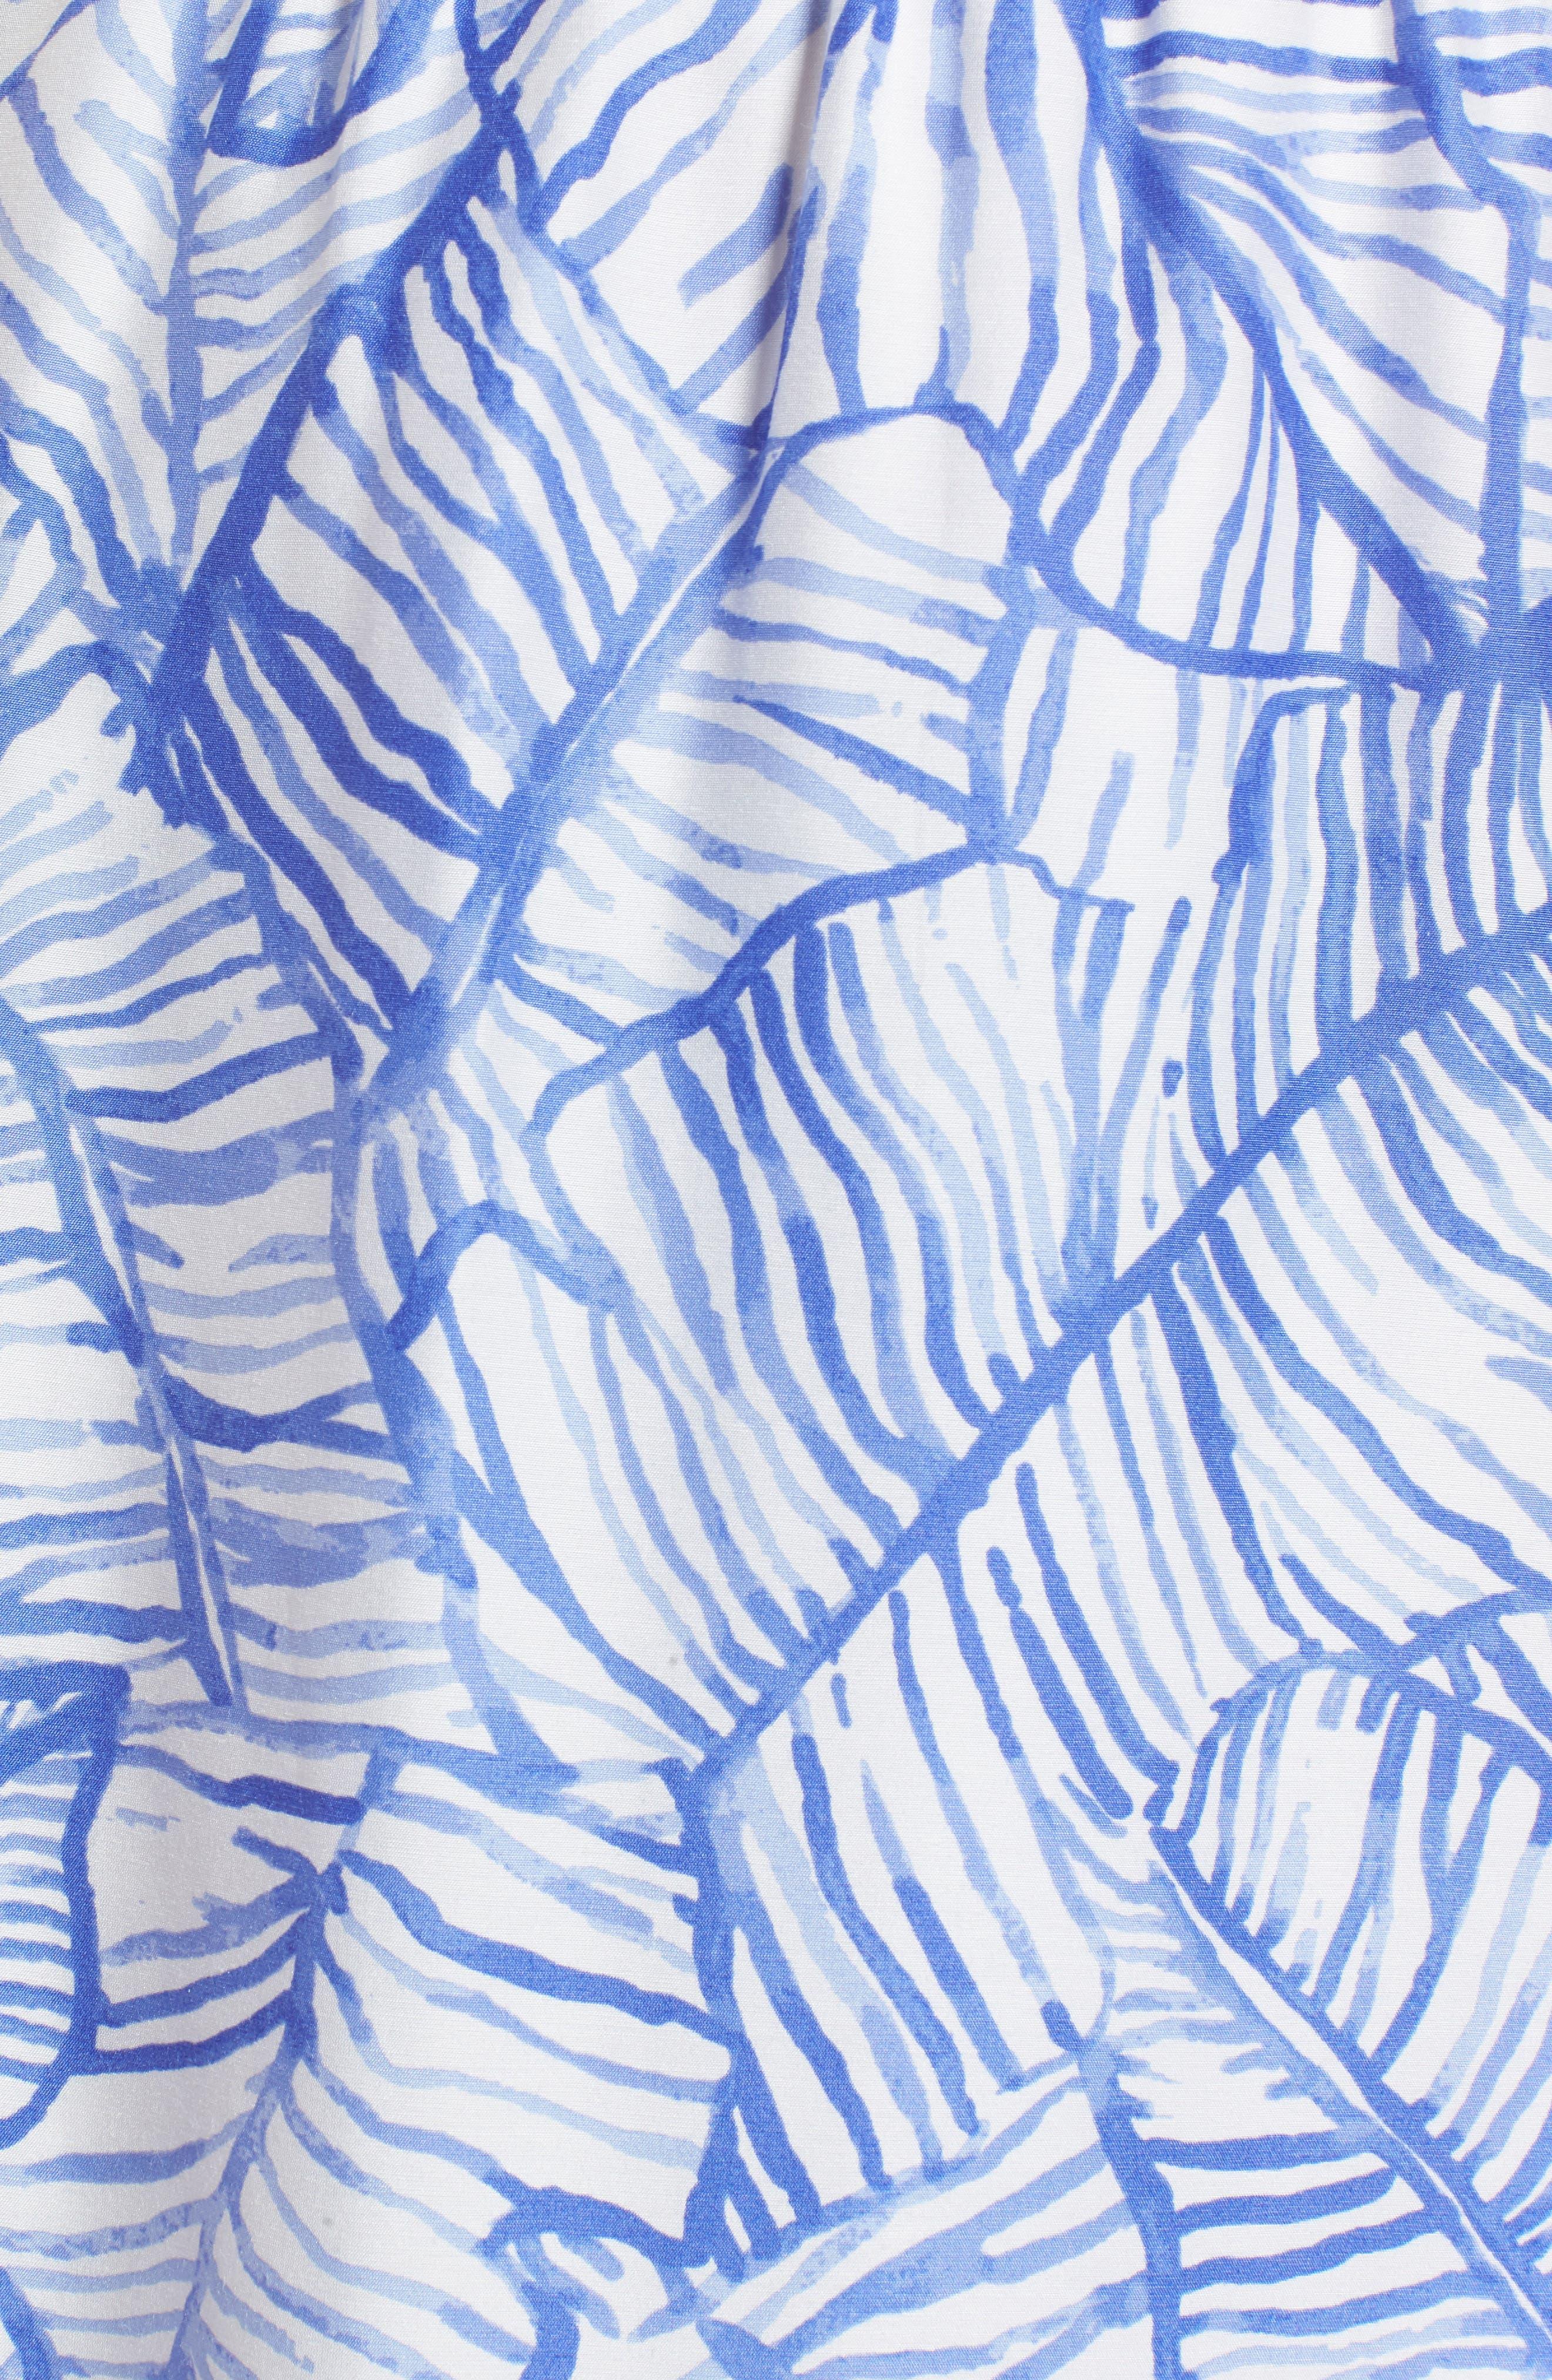 Banana Leaf High/Low Maxi Dress,                             Alternate thumbnail 5, color,